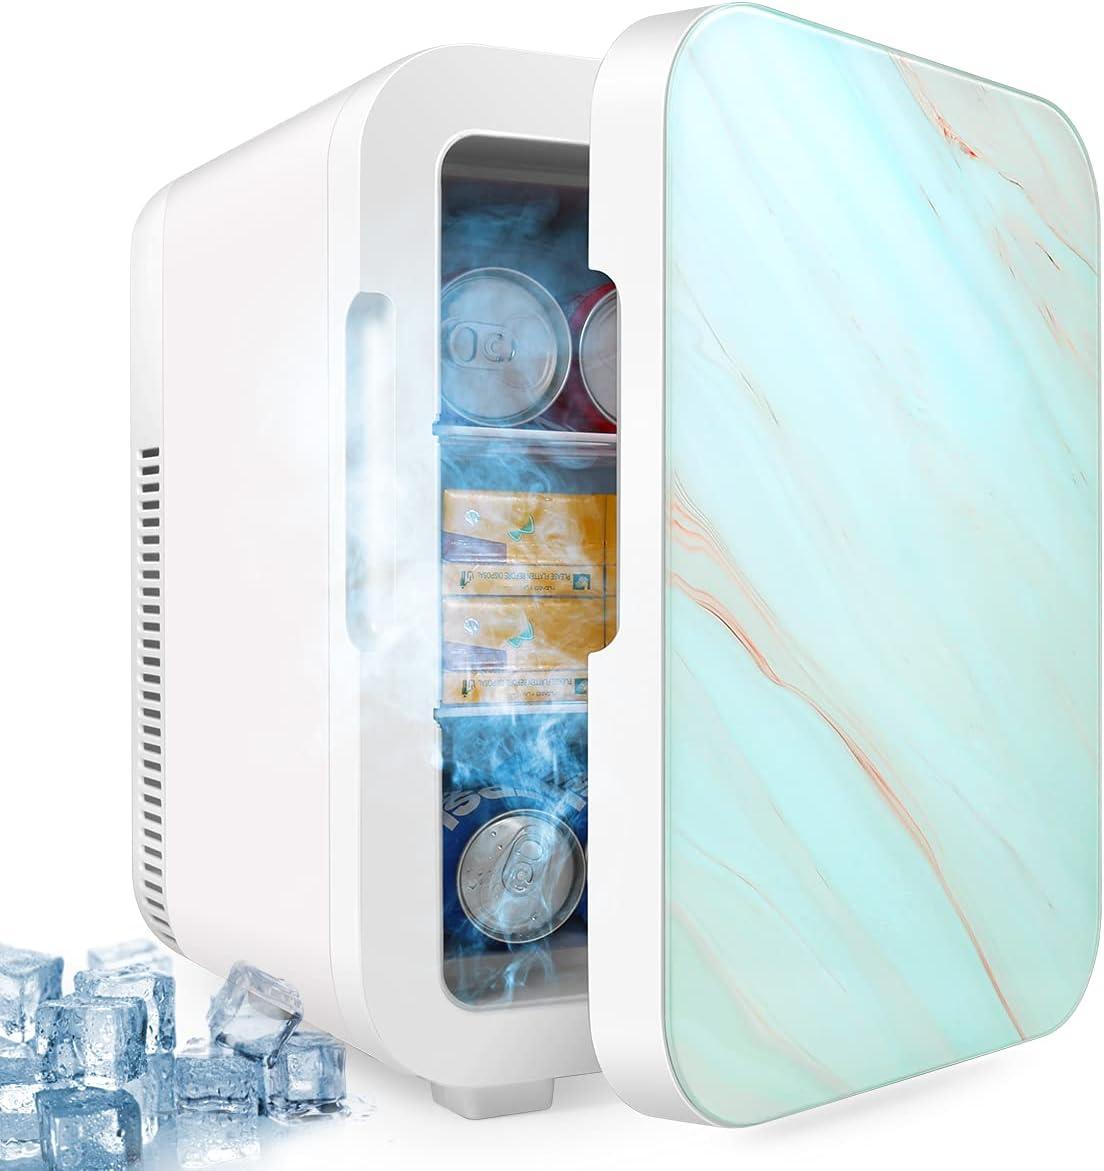 10L Mini Fridge, Portable Freezer, Large Capacity Compact Cooler and Warmer with Control Temperature, Single Door Mini Fridge Freezer for Cars, Road Trips, Homes